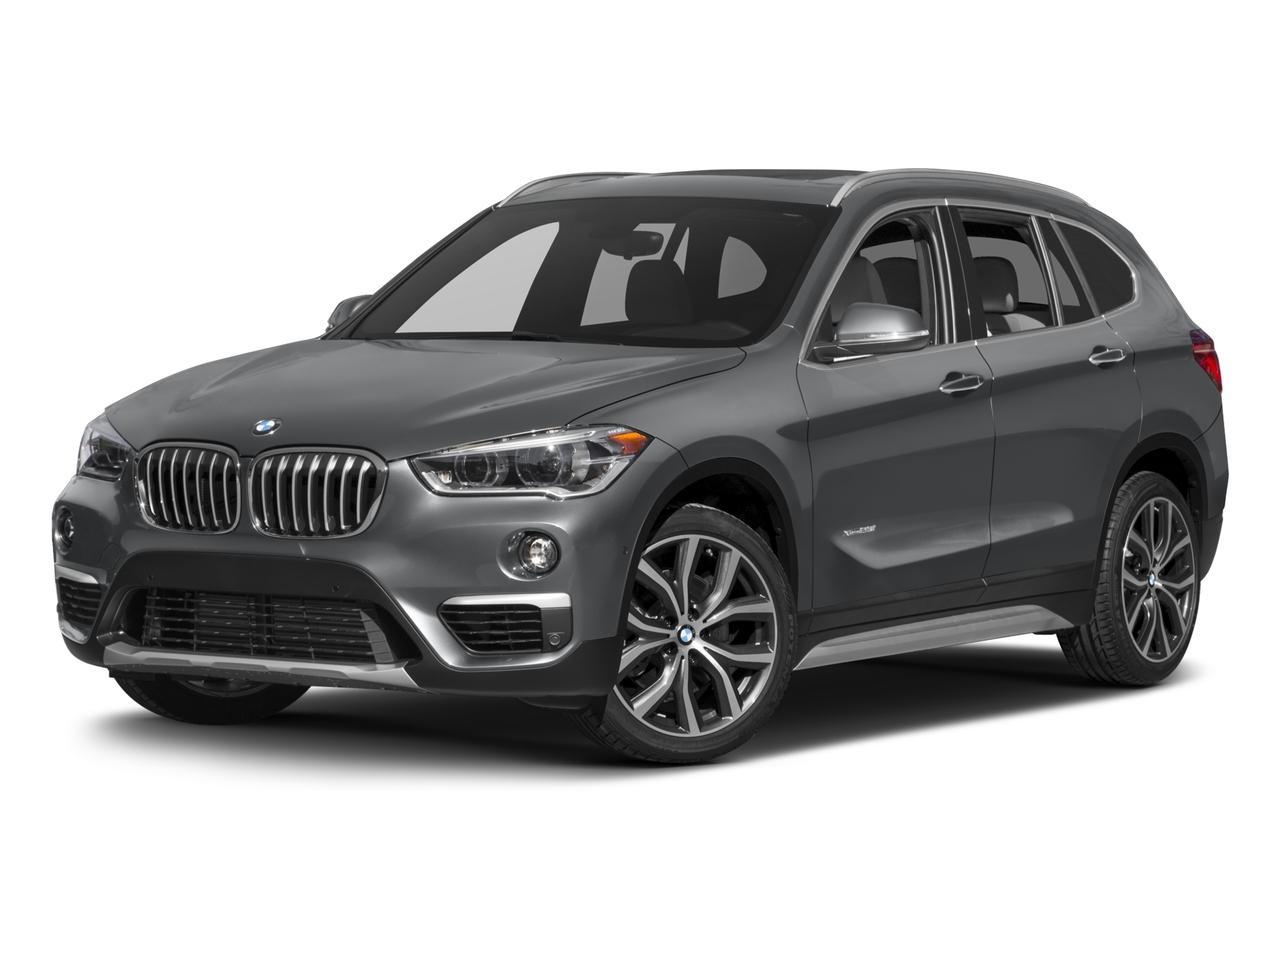 2017 BMW X1 xDrive28i Vehicle Photo in MADISON, WI 53713-3220